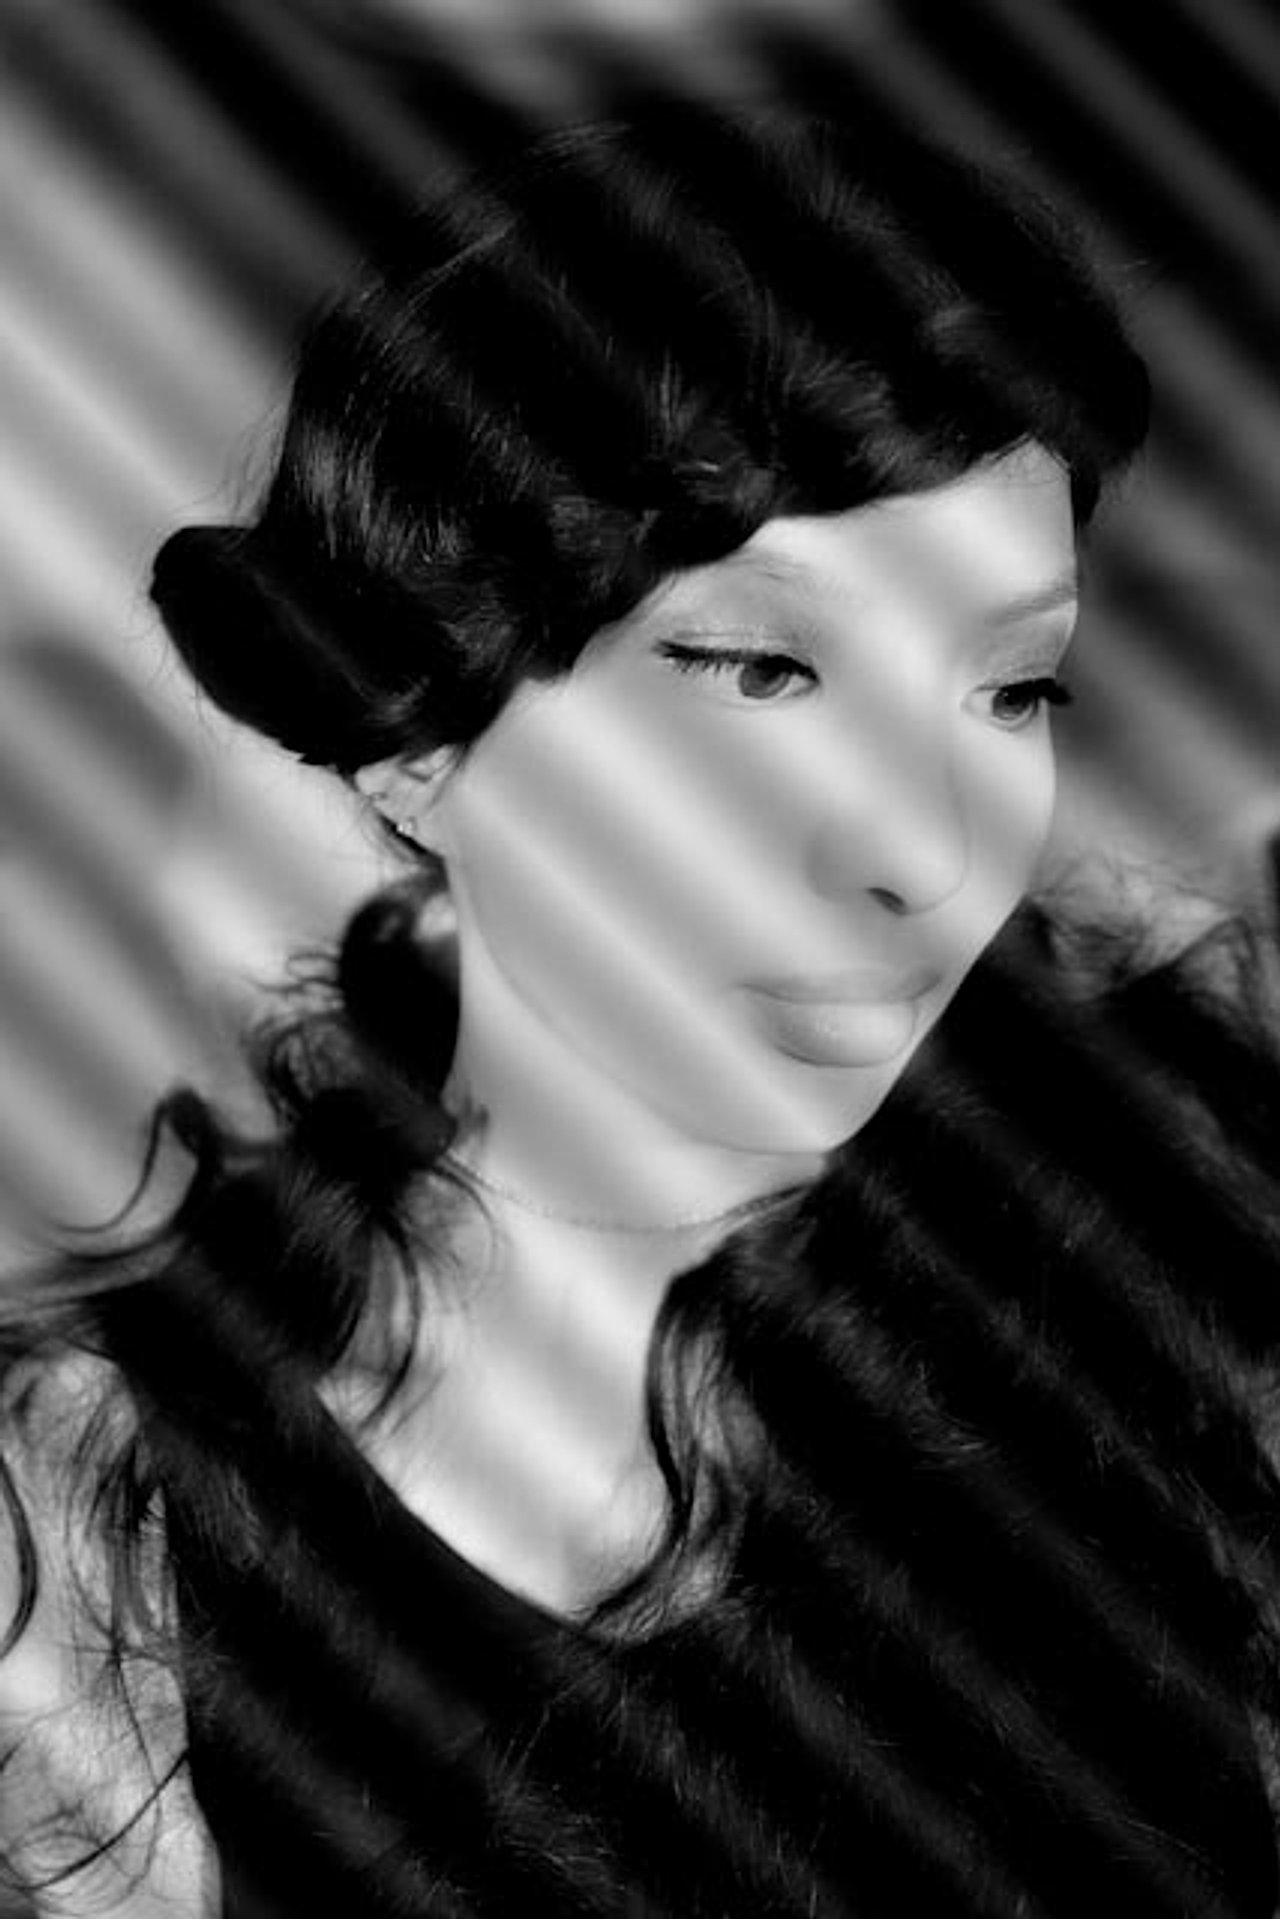 julie girard artiste coiffeur - Artiste Coiffeur Coloriste